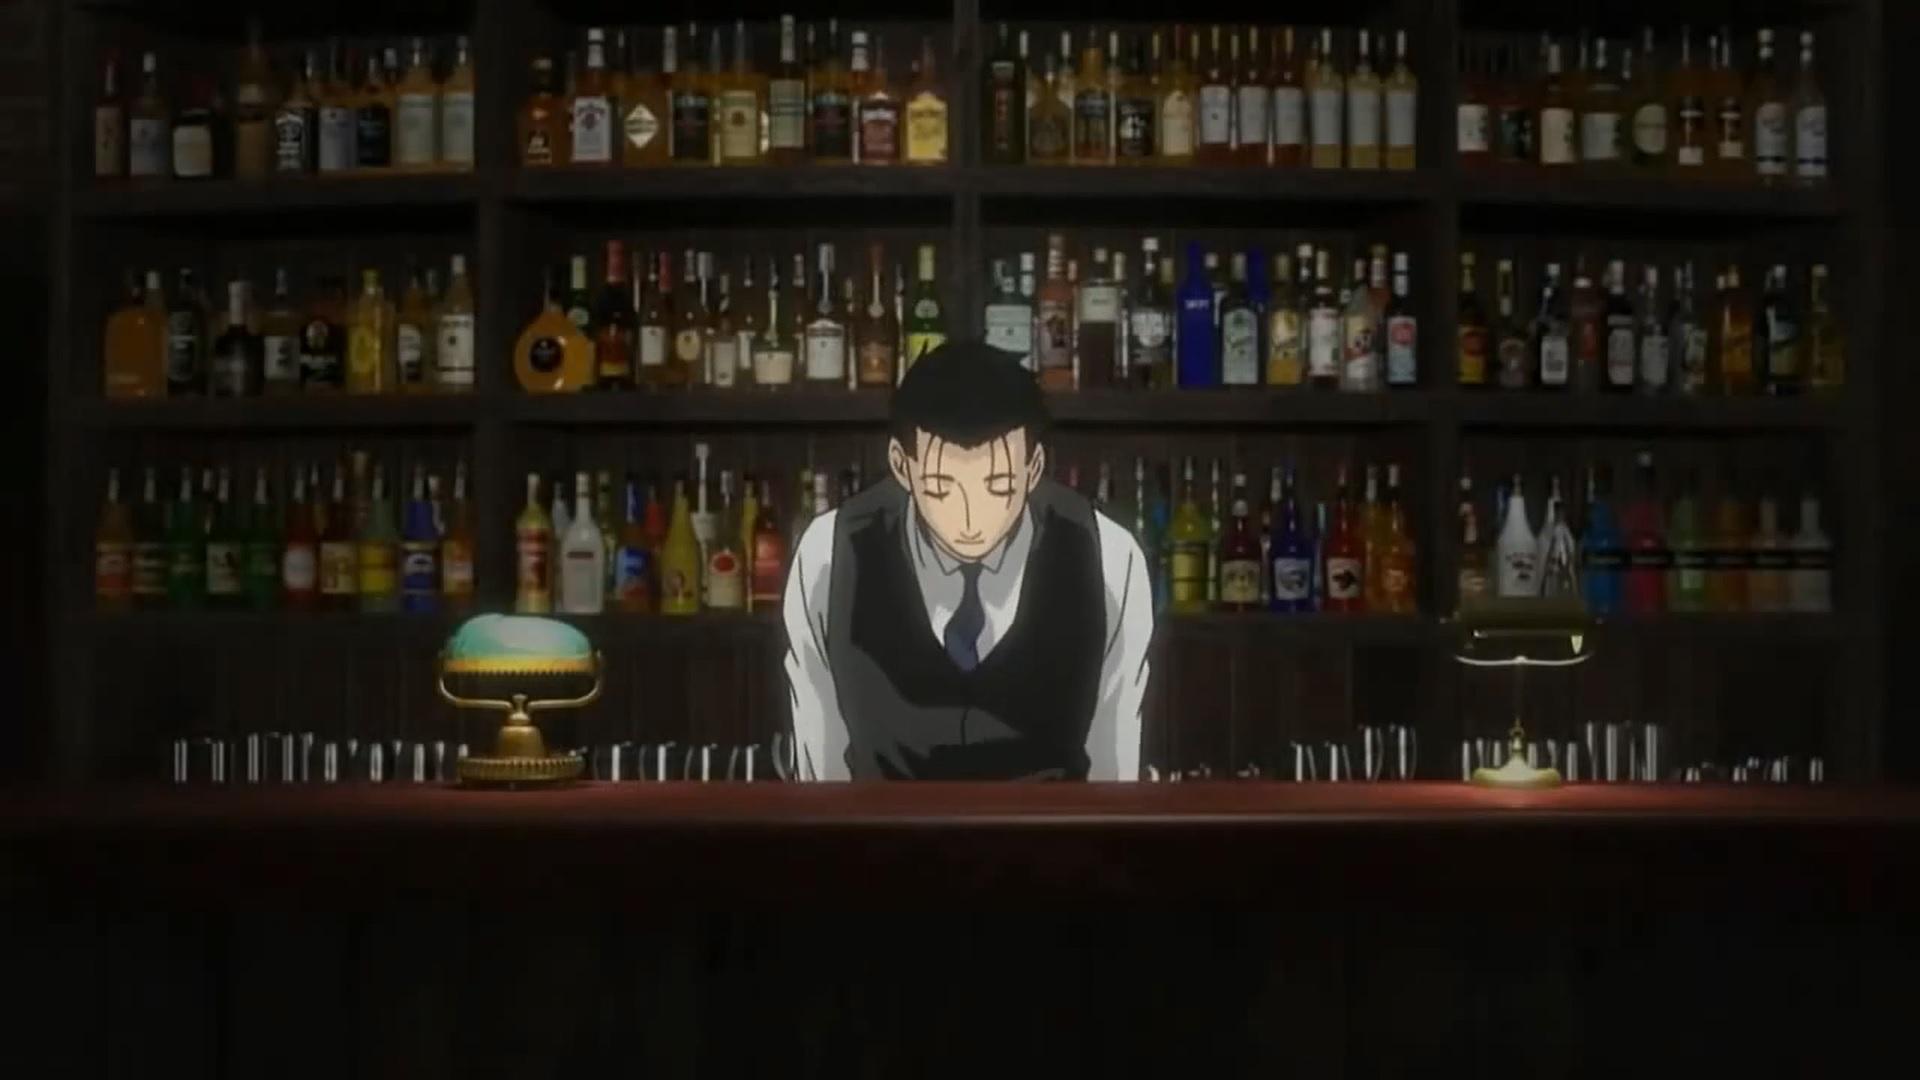 [BAR] Elizabeth's Bar Bartender2_20150404224430